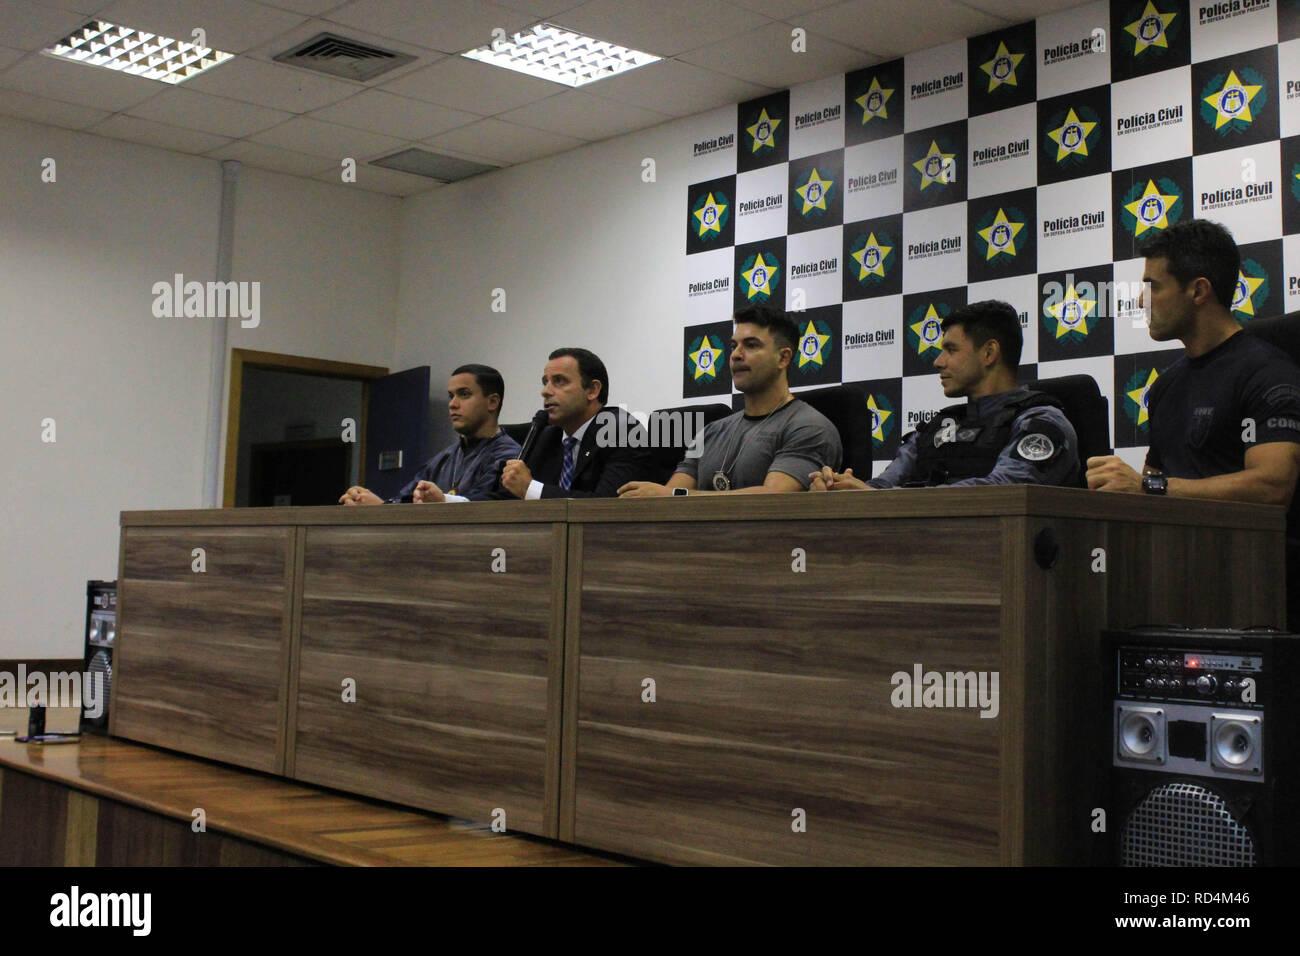 RJ - Rio de Janeiro - 17/01/2019 - Press conference - Operates to